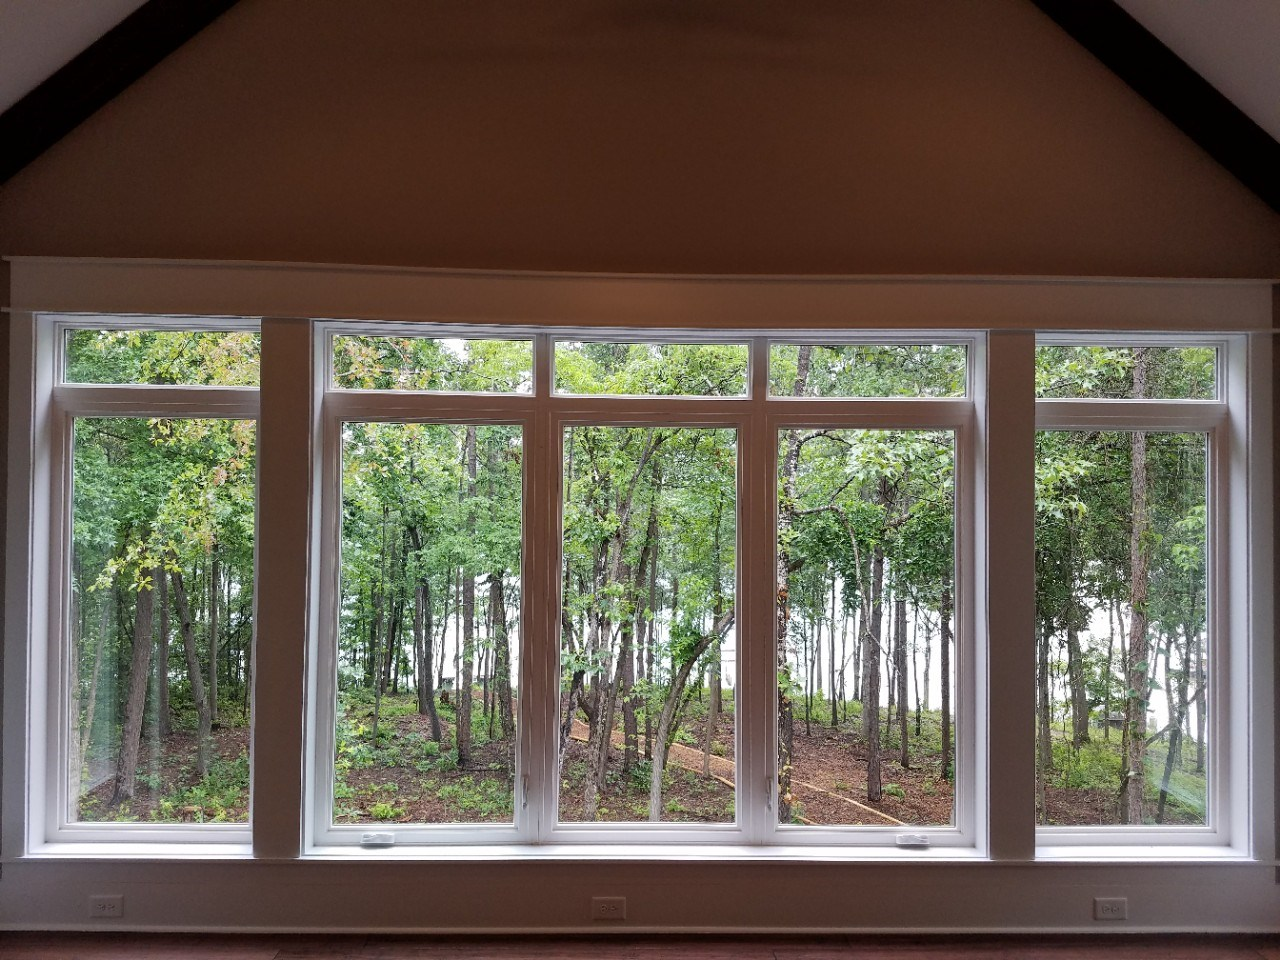 Johnson large window view